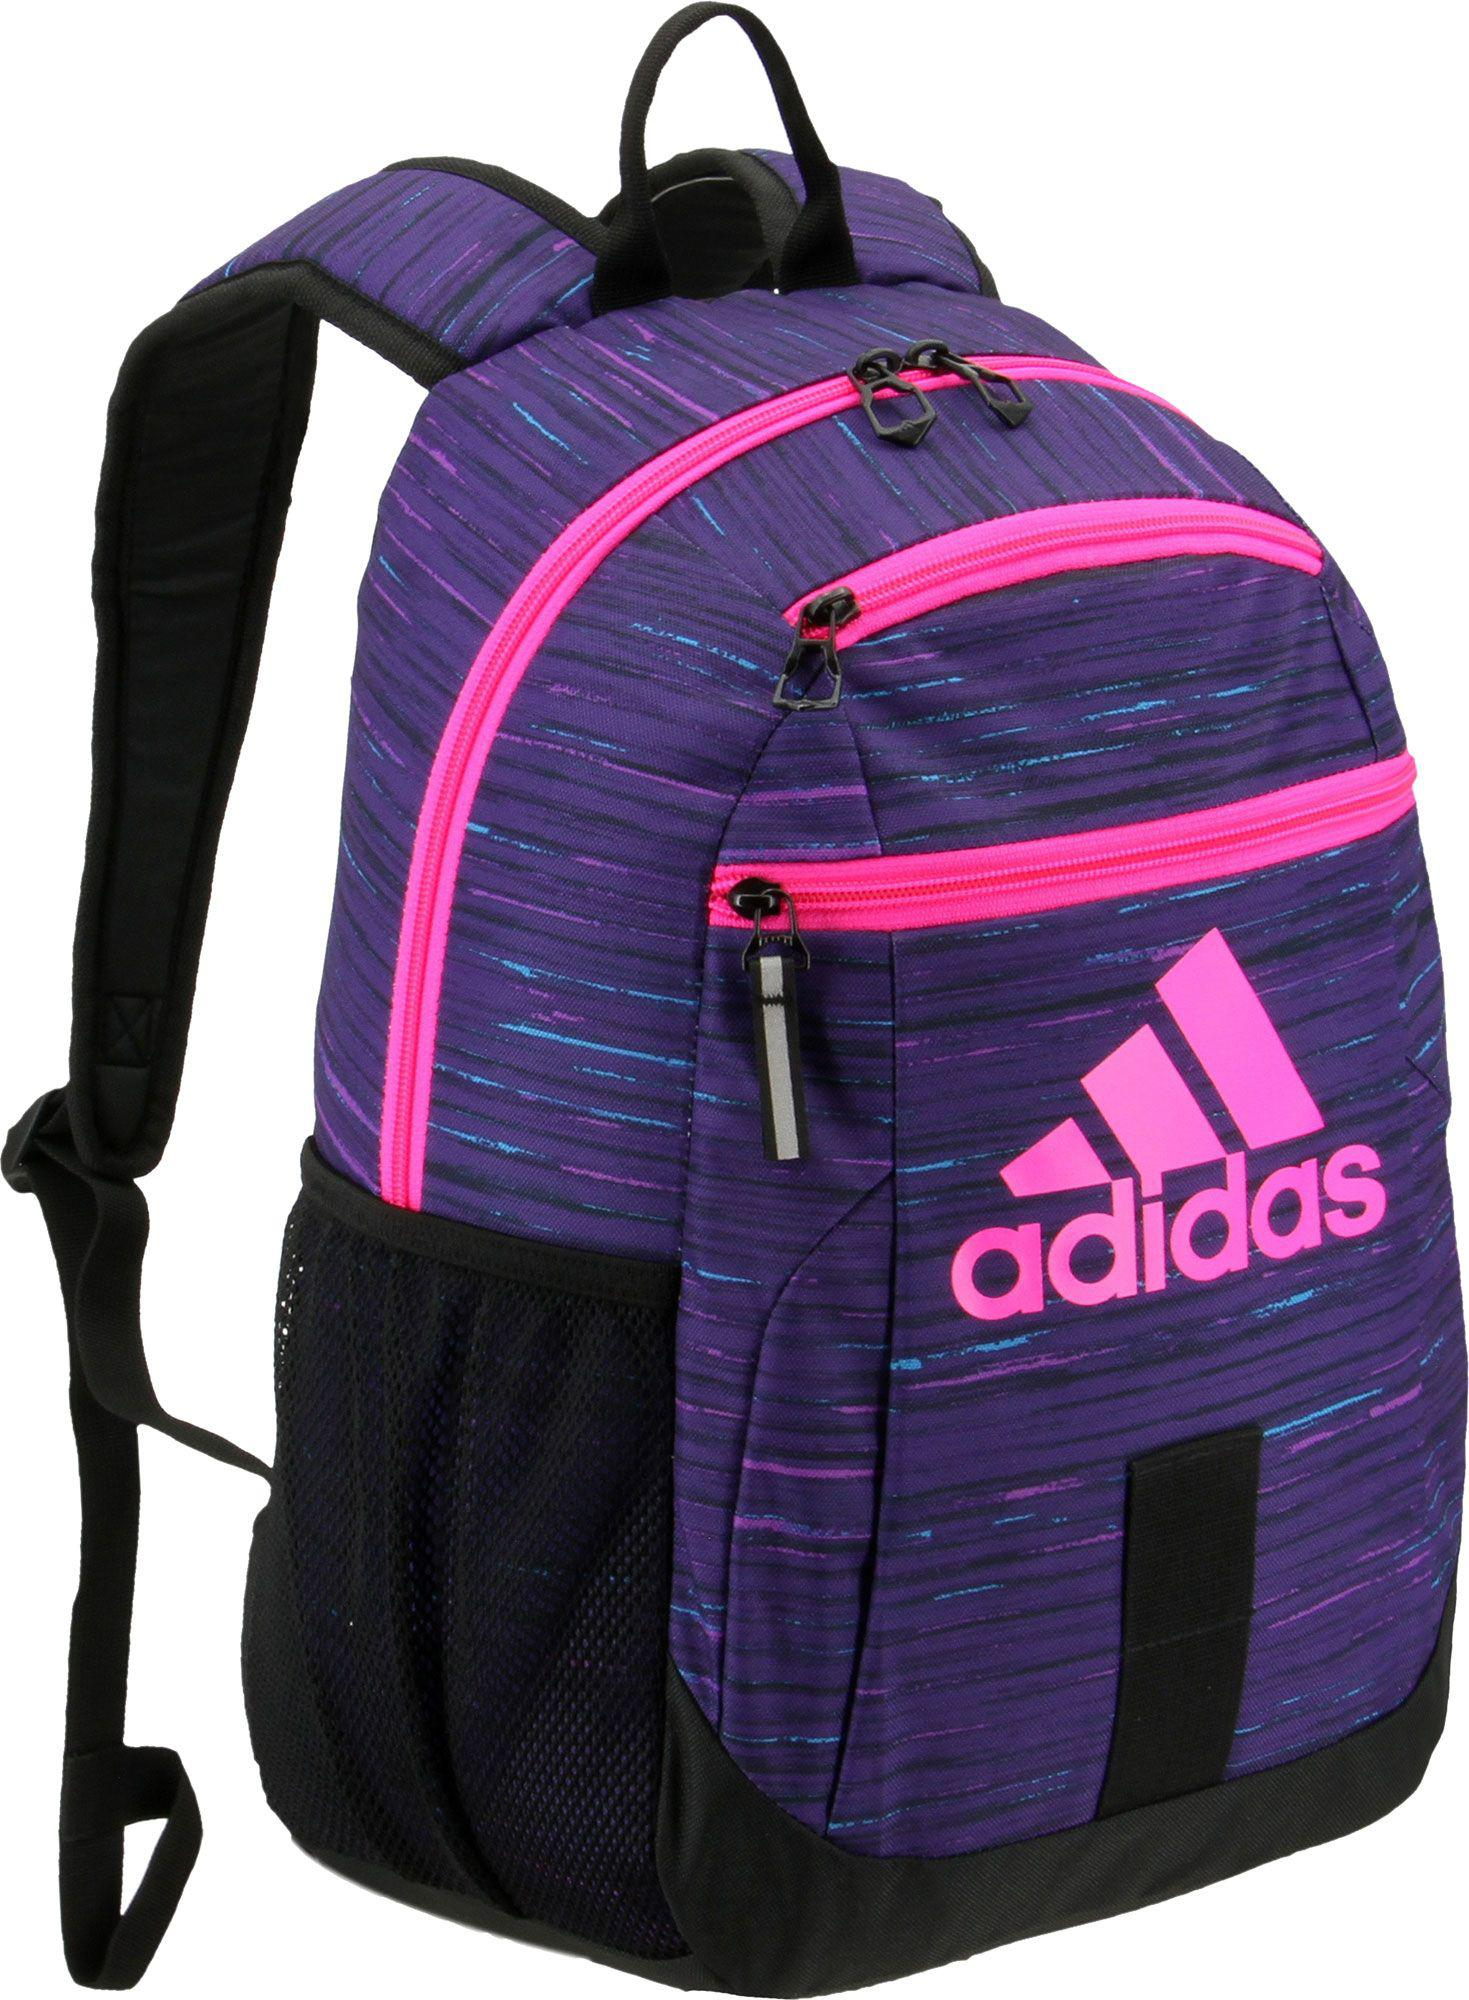 1aa64583ec19 Adidas - Purple Youth Young Creator Backpack - Lyst. View fullscreen